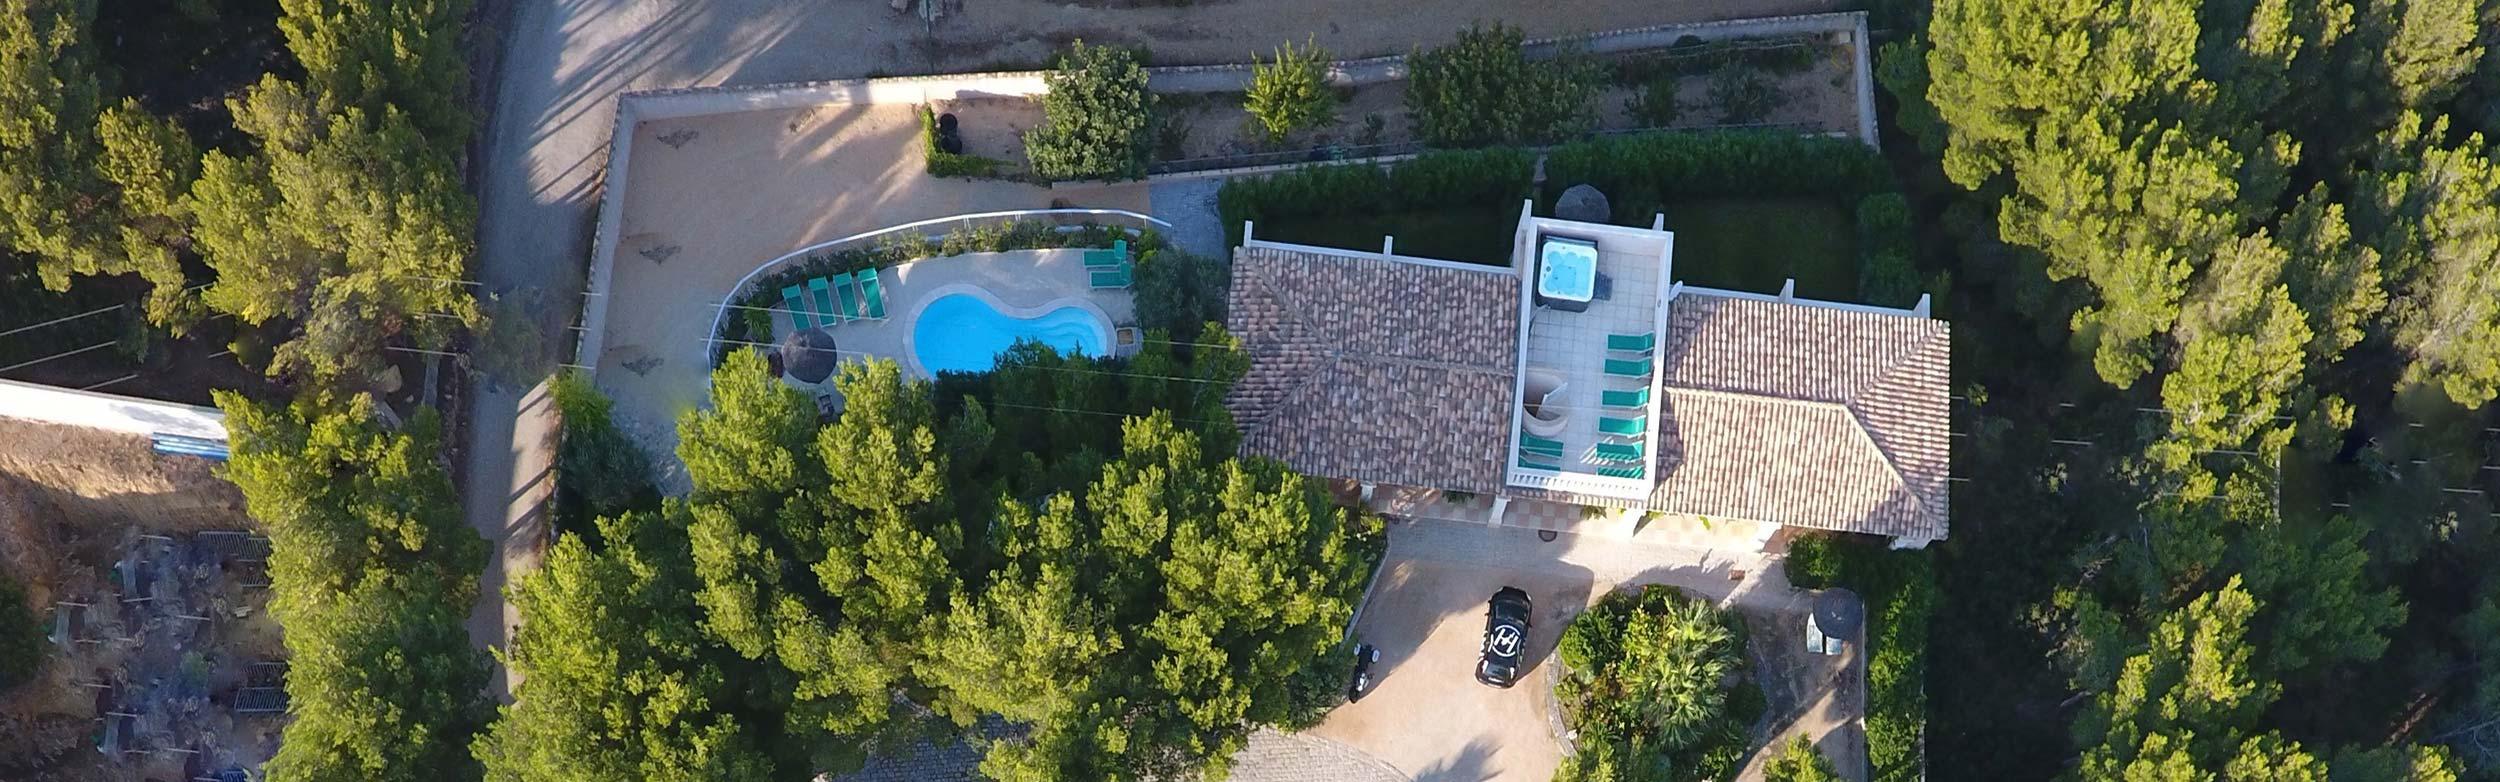 La Palmeraie des Calanques Chambres d h´tes en Provence